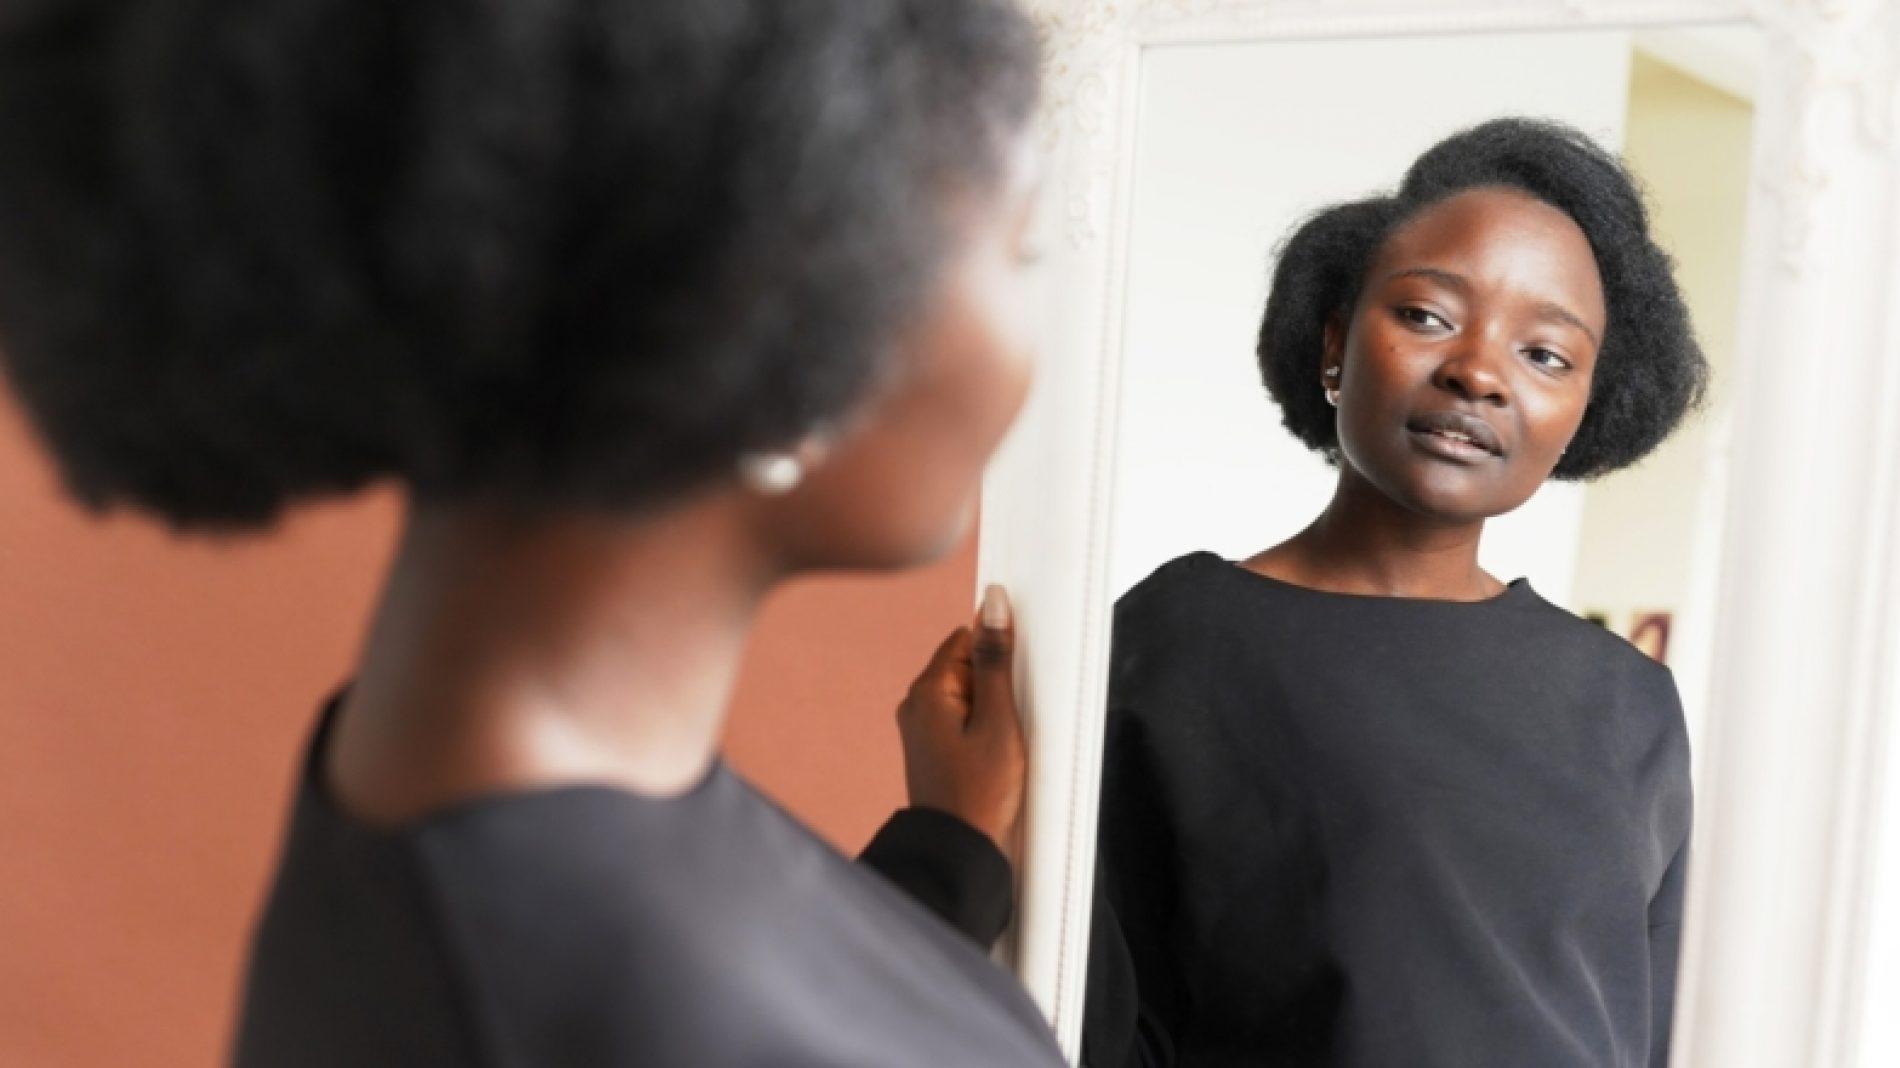 mirror-woman-african-dark-skinned-people-lifestyle-lifestyles-enjoyment-reflection-candid-beautiful_t20_ZYA8Pb-1-zvHCUt